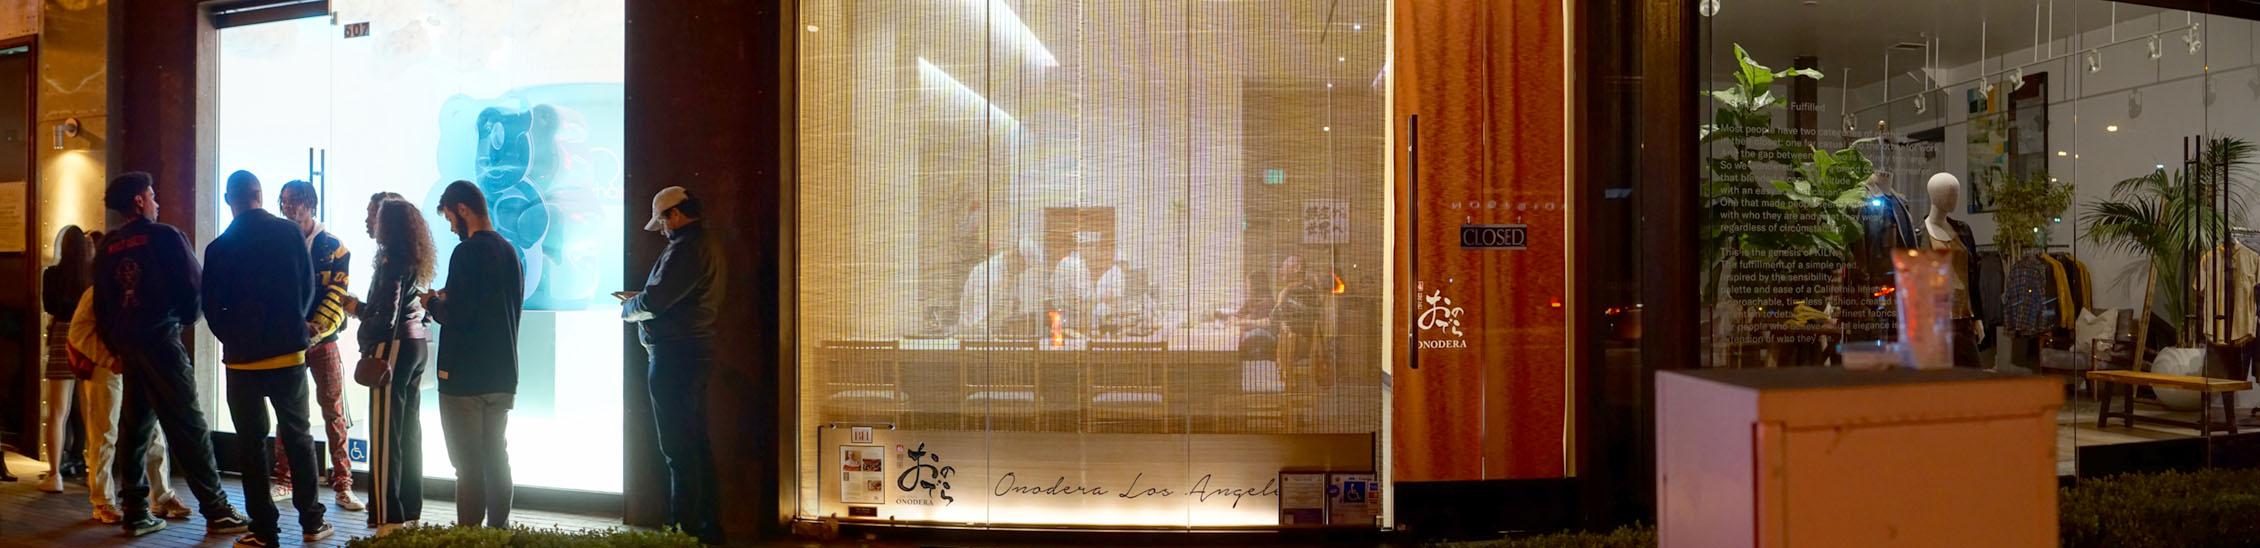 Sushi Ginza Onodera Exterior